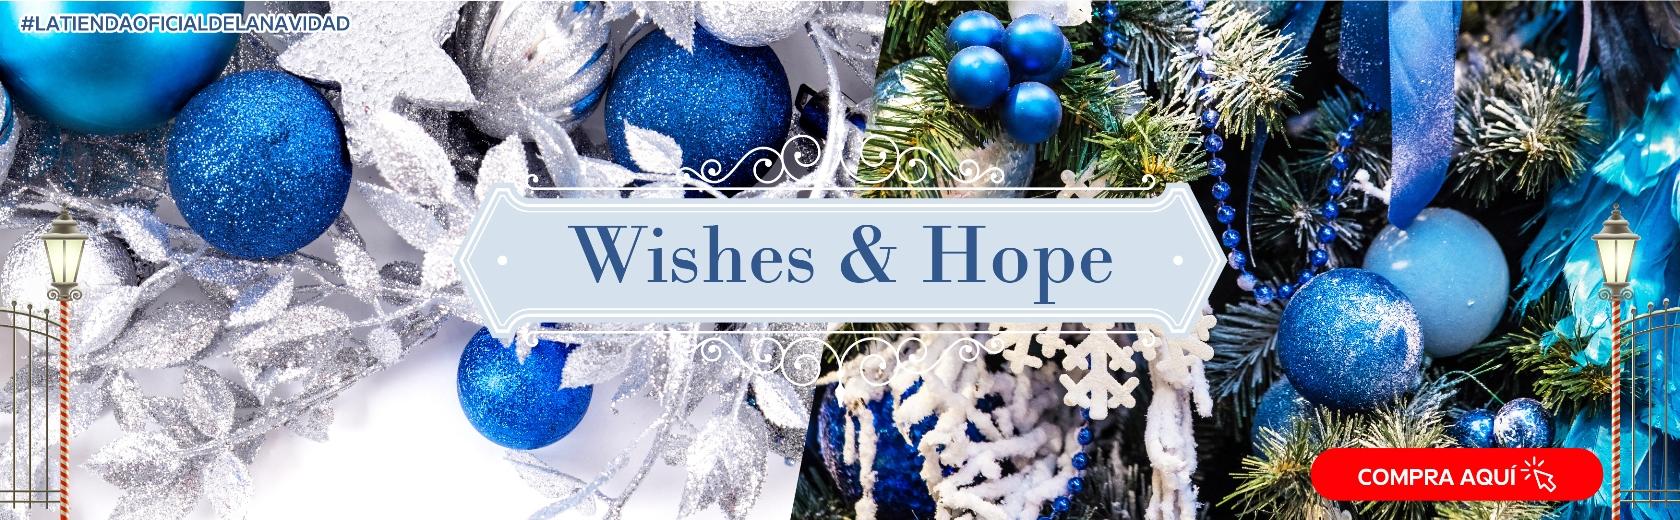 Wishes & Hope